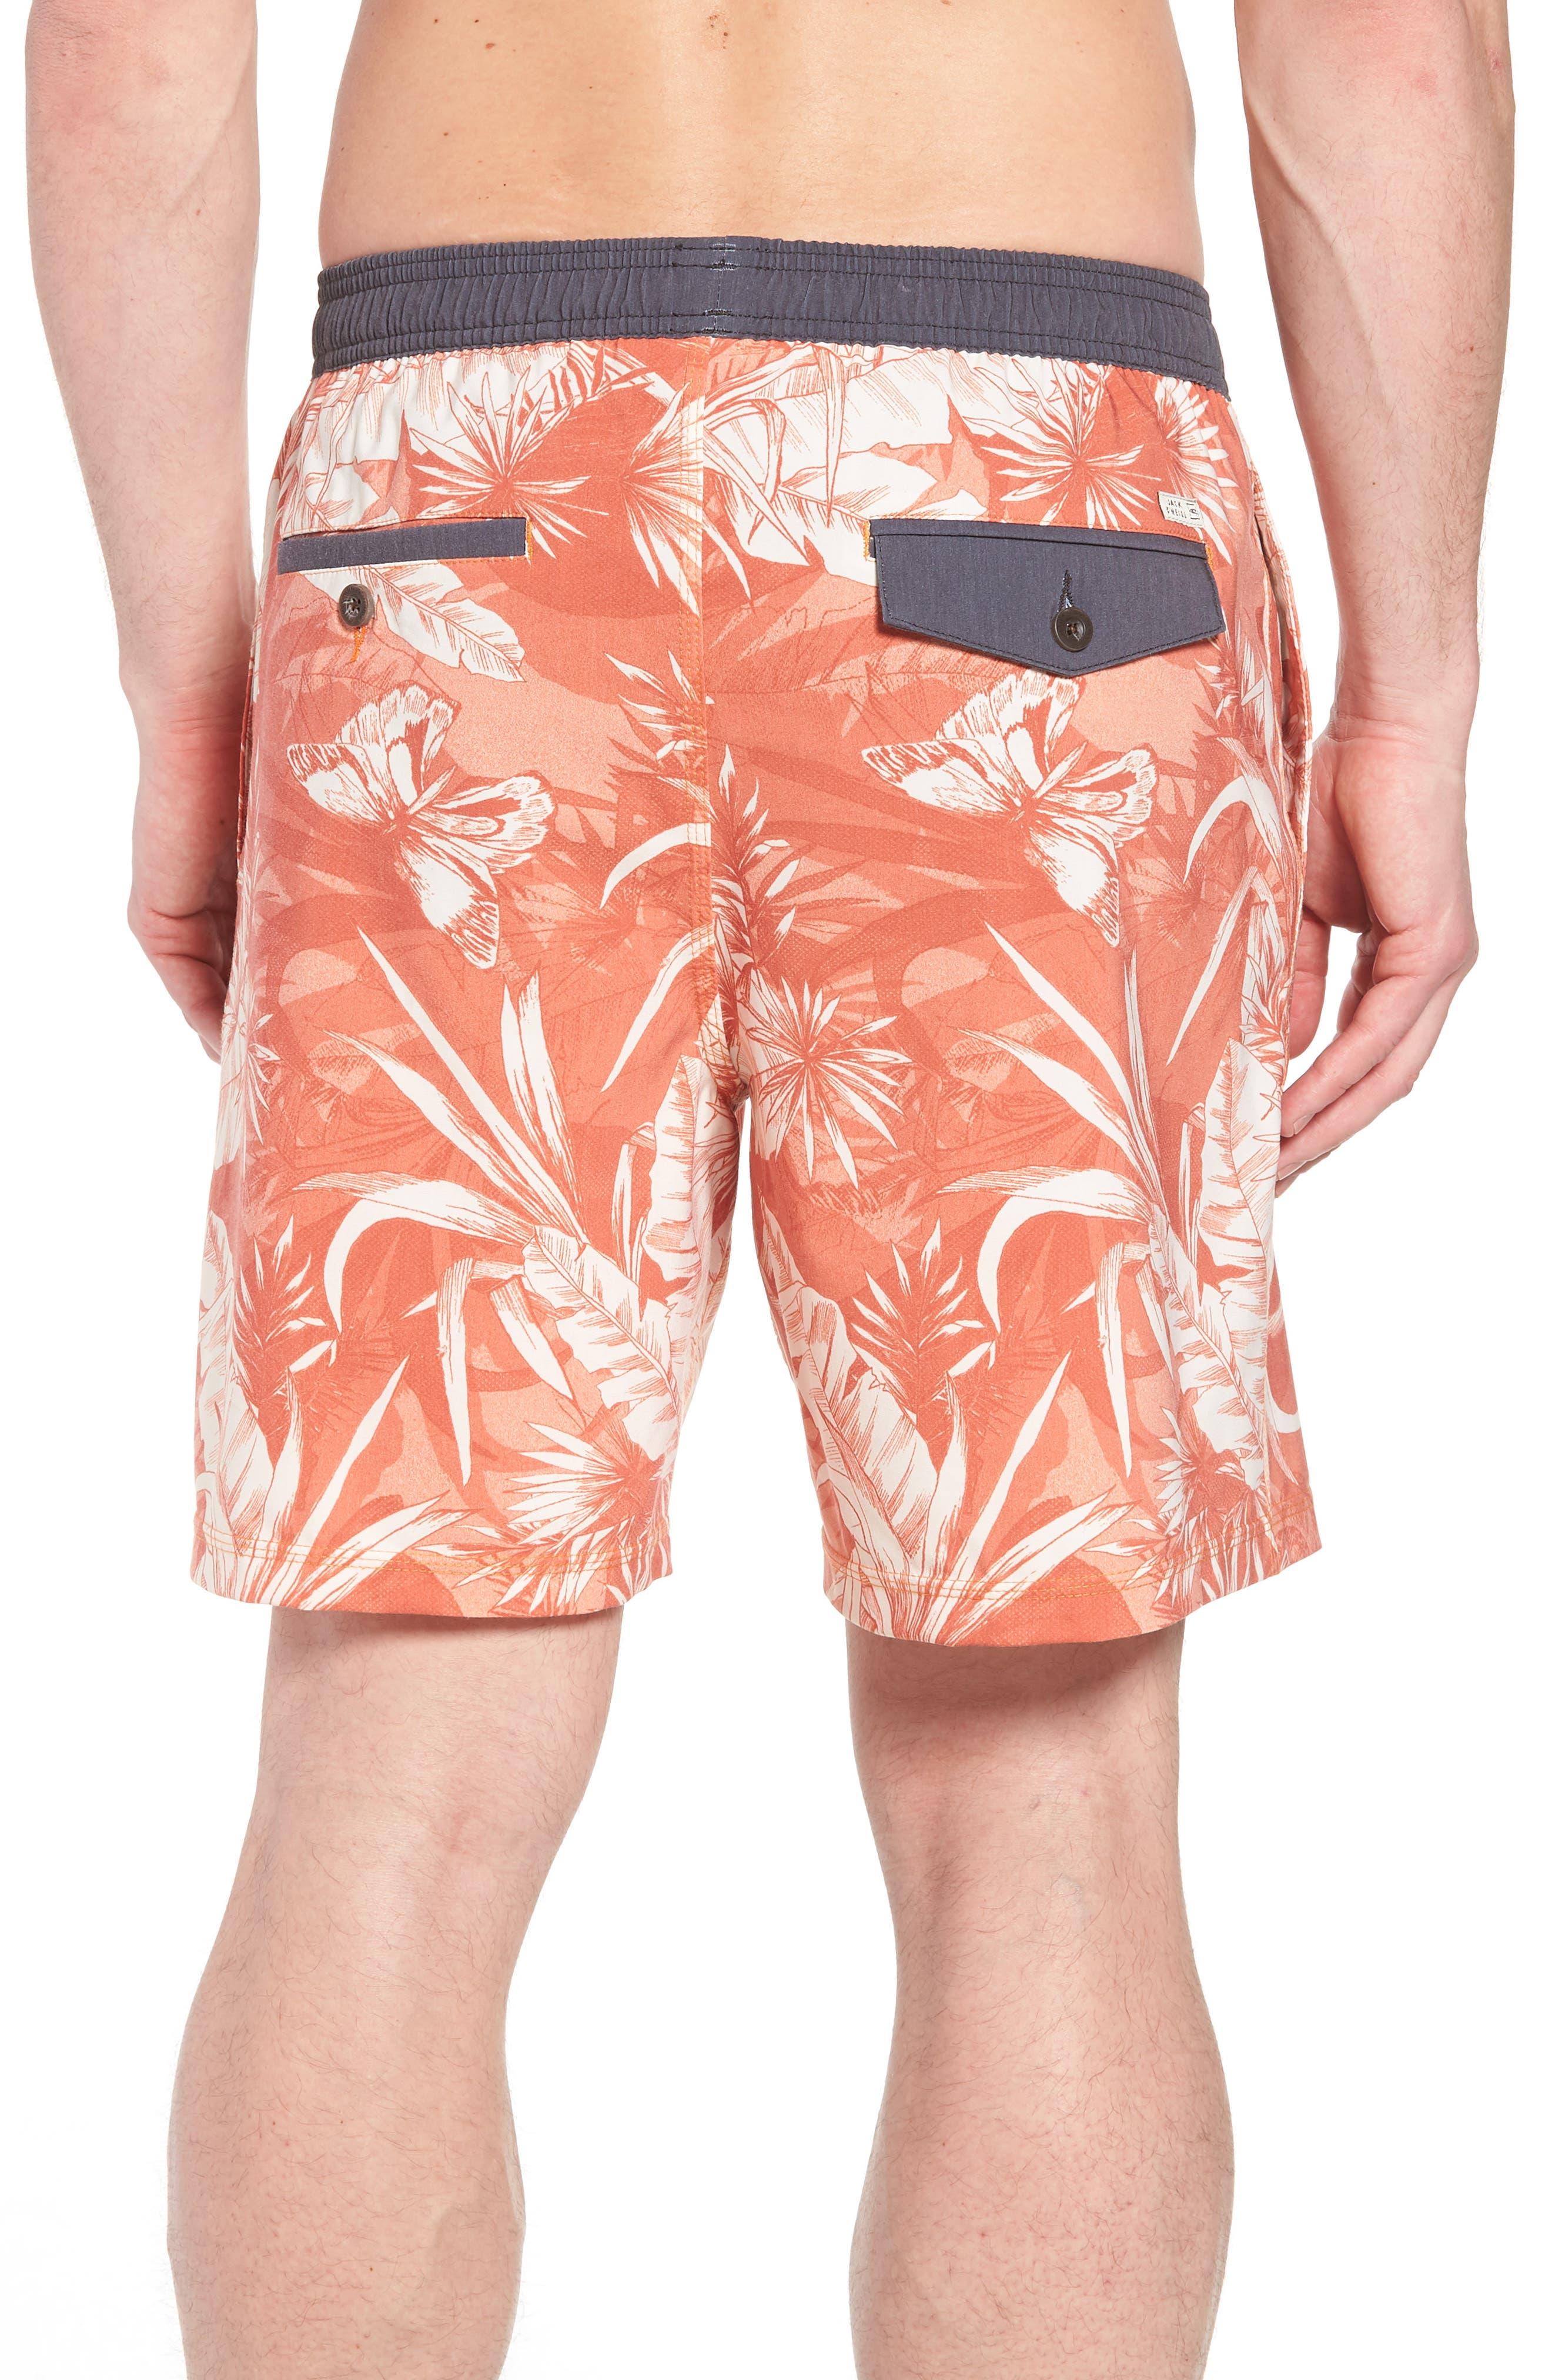 Sunset Board Shorts,                             Alternate thumbnail 2, color,                             214